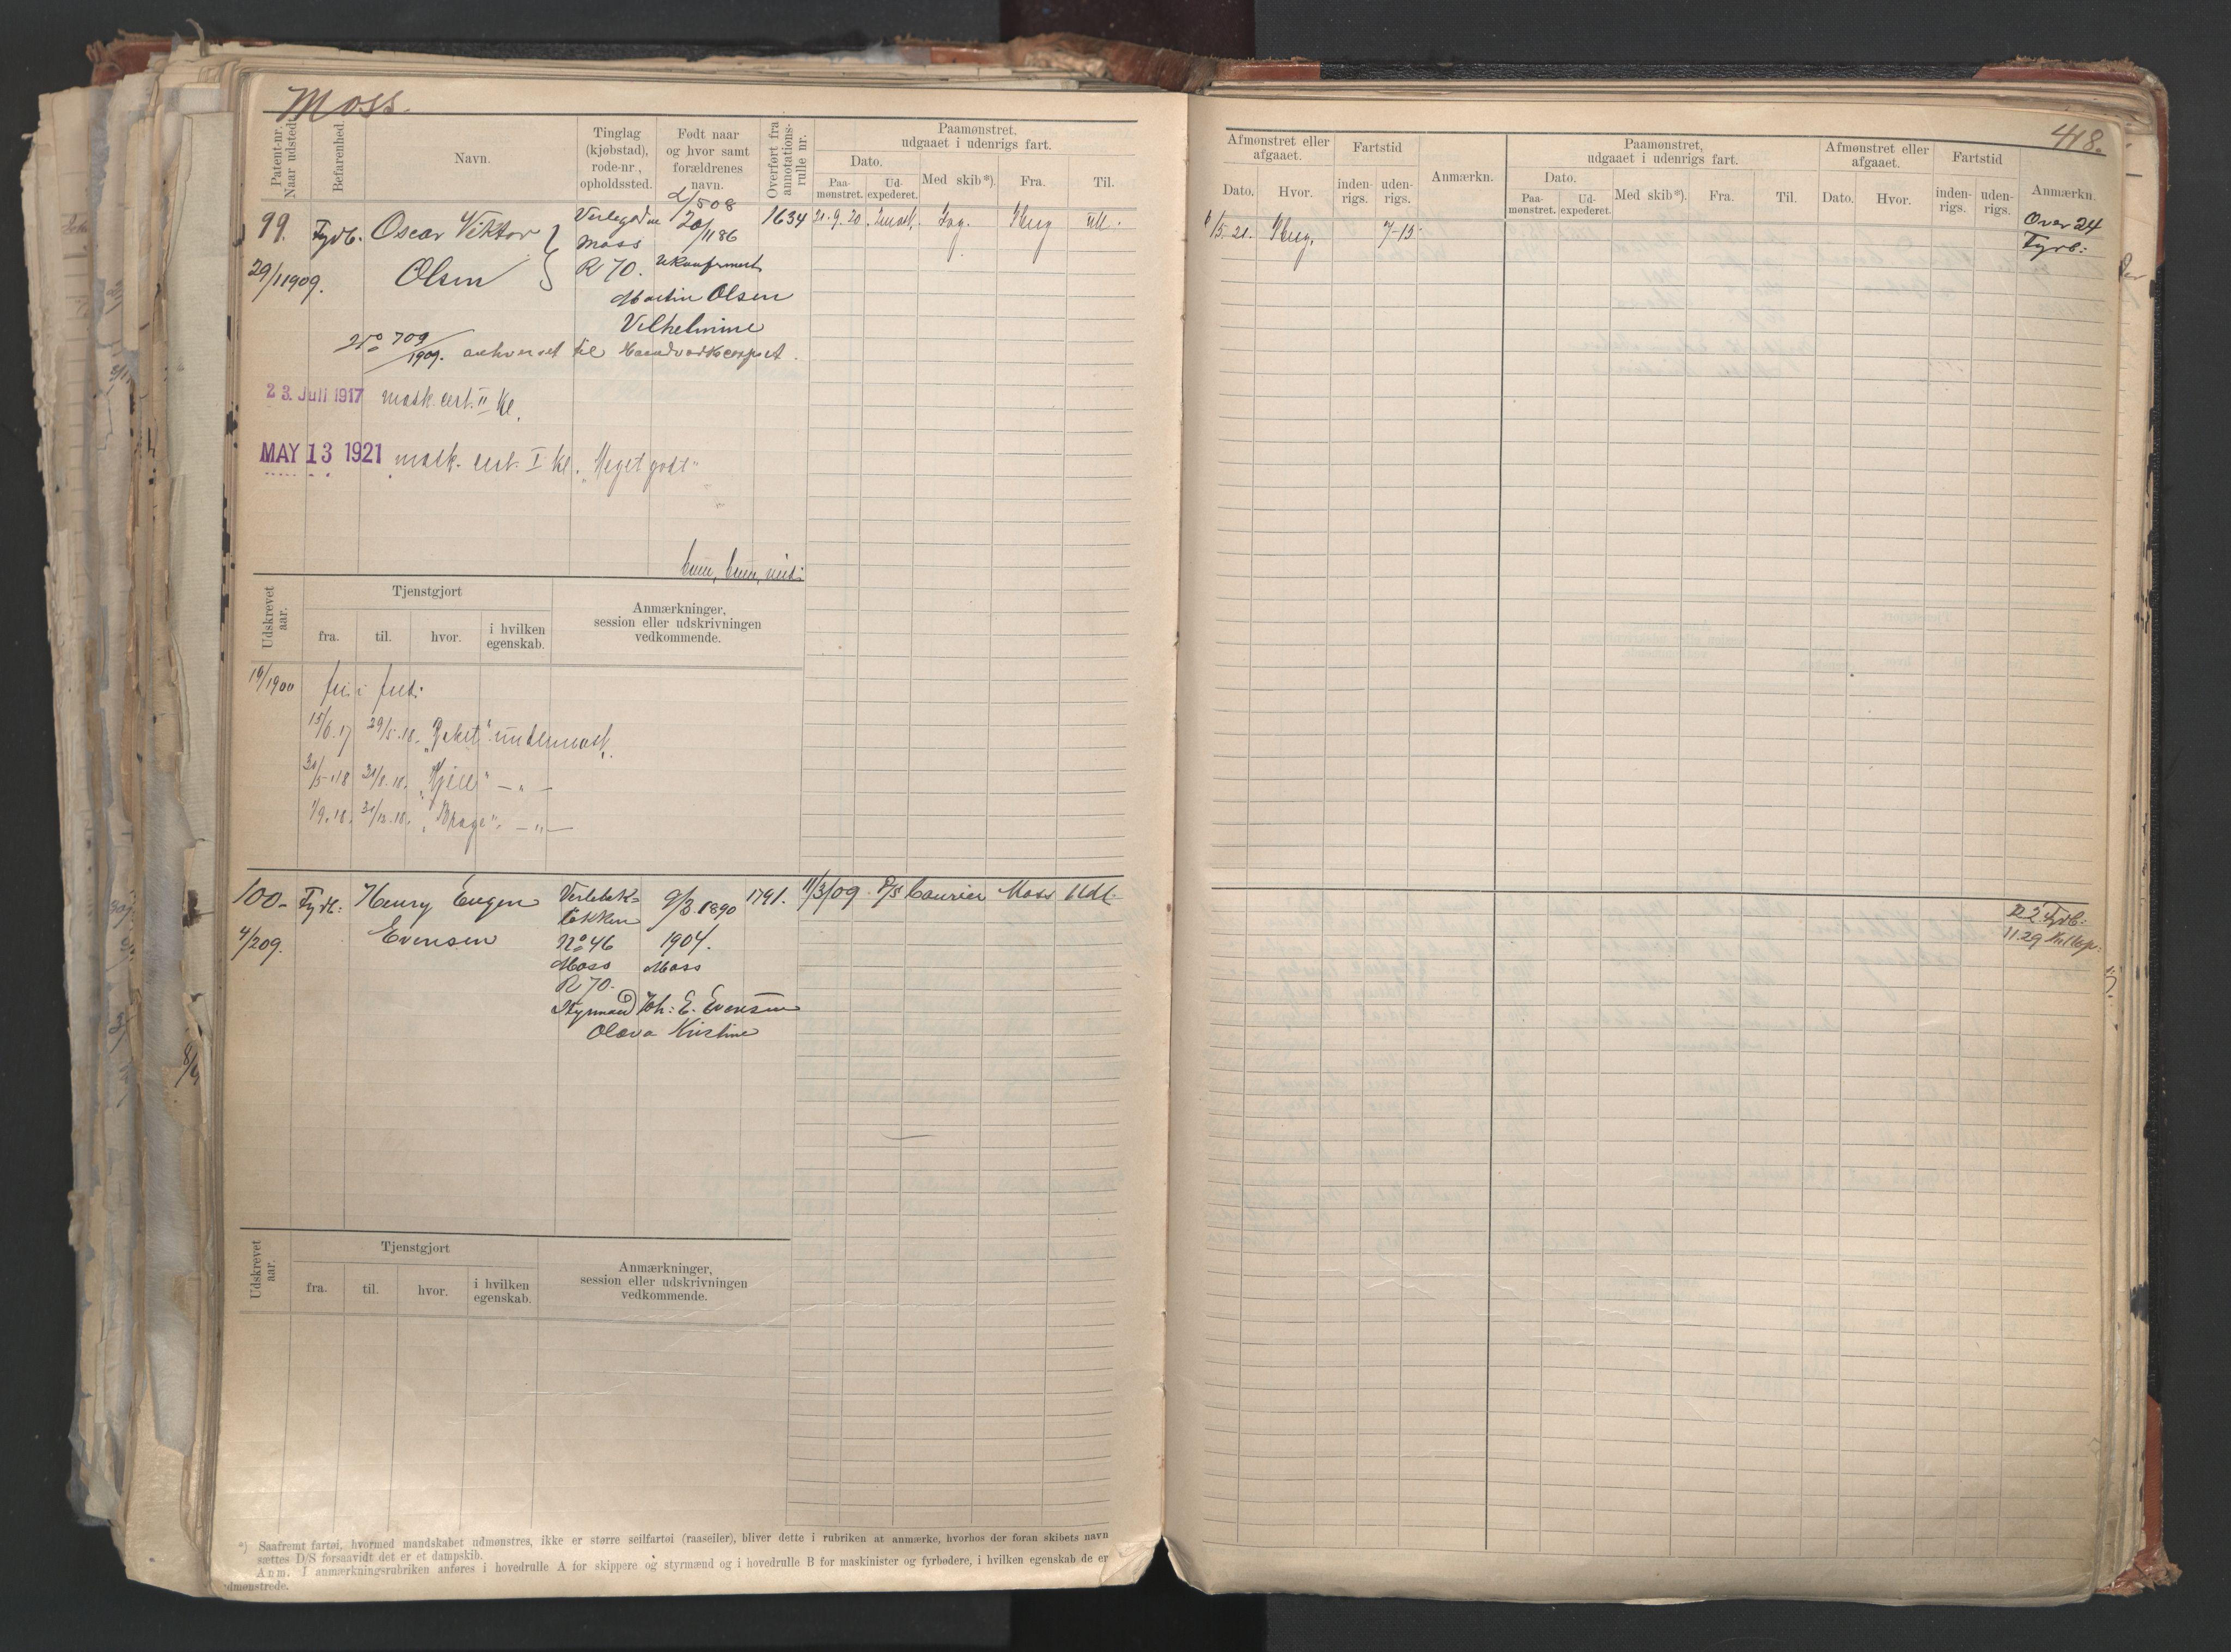 SAO, Oslo sjømannskontor, F/Fd/L0006: B-rulle, 1883, s. 417b-418a